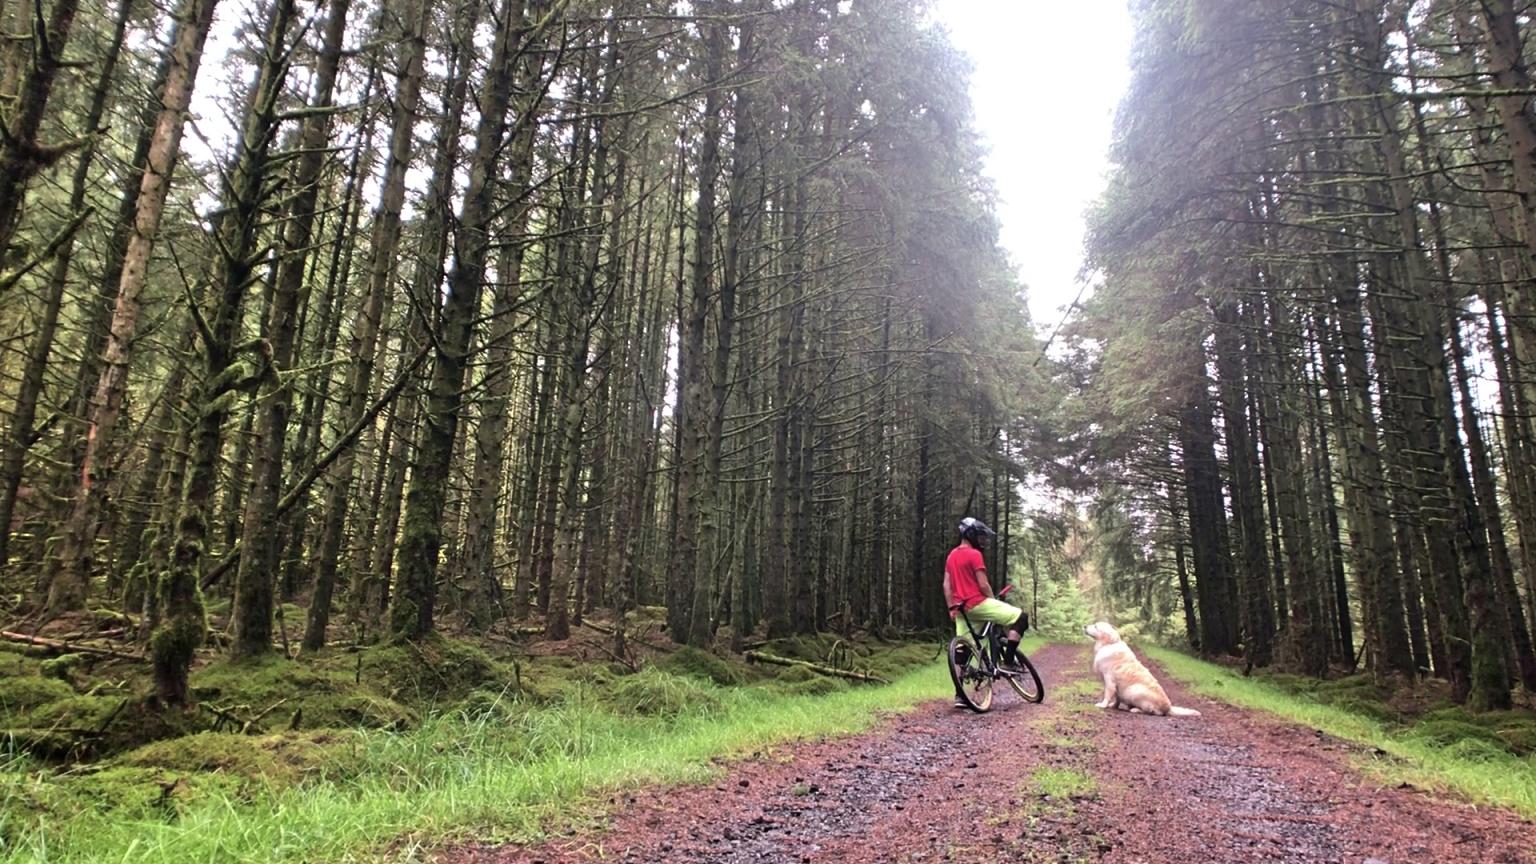 ni_explorer_davagh_forest_mountain_biking_northern_ireland (10).jpg